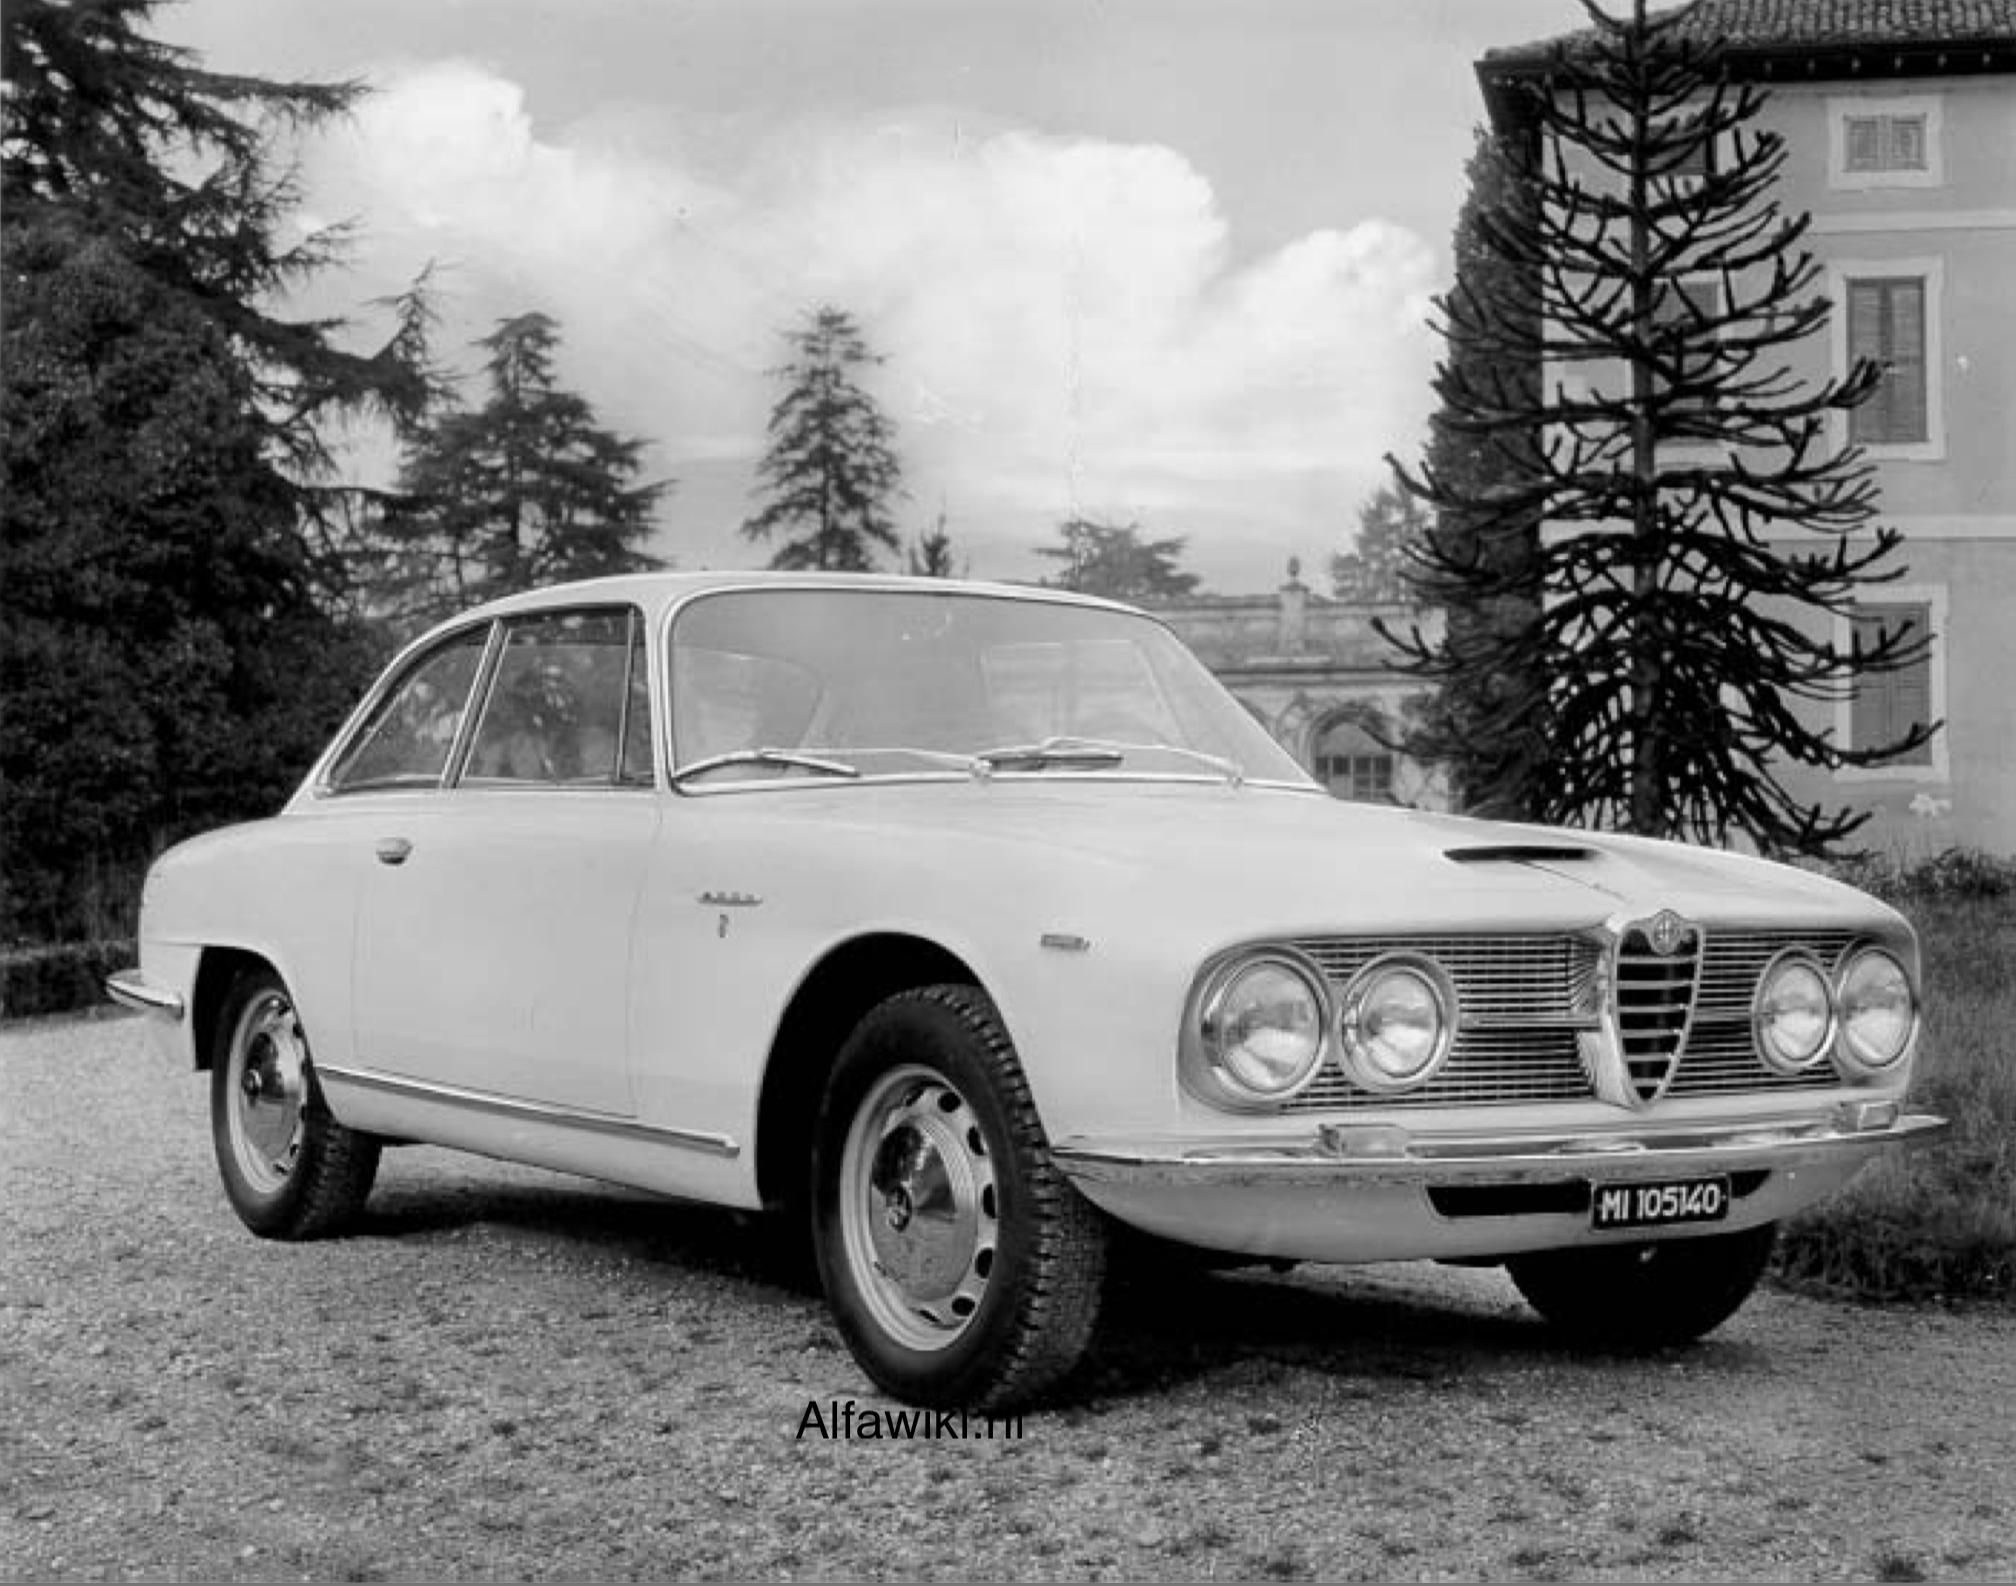 Alfa Romeo 2600 press photos